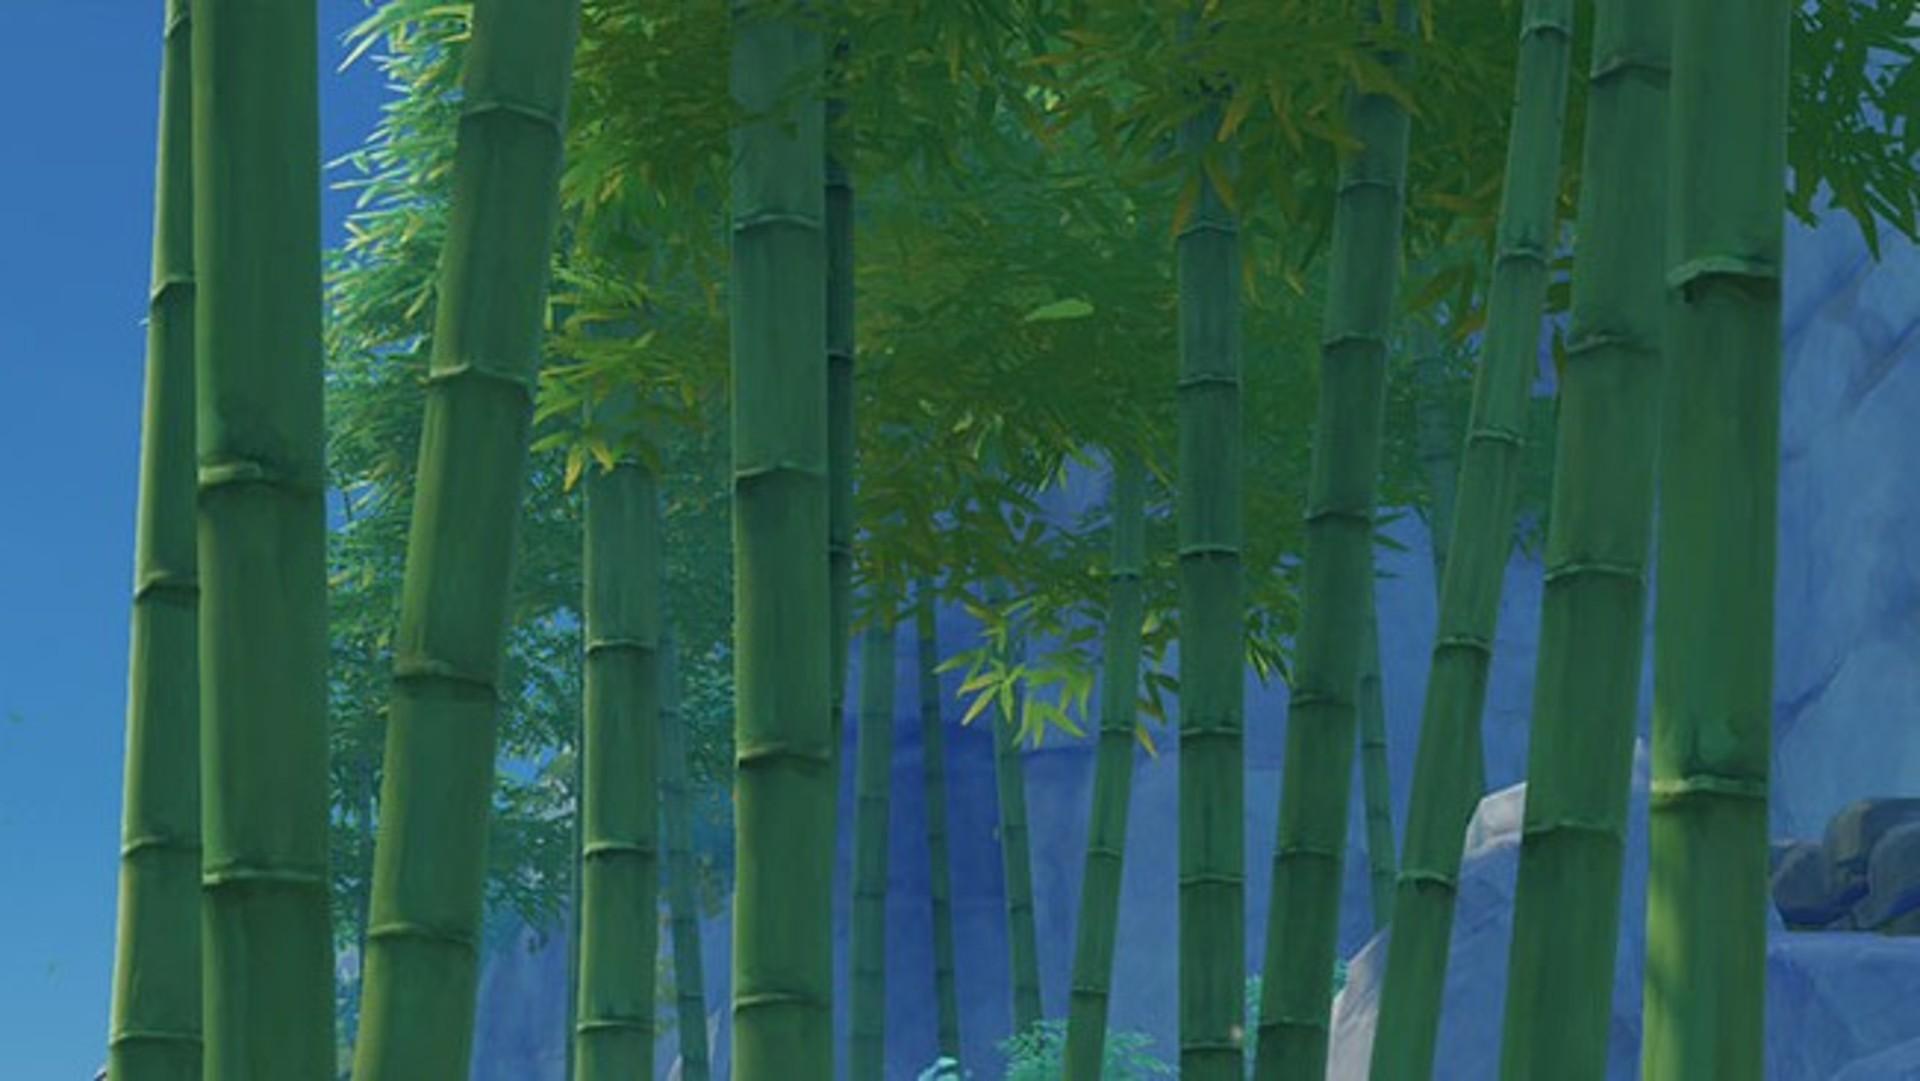 genshin impact bamboo segment locations